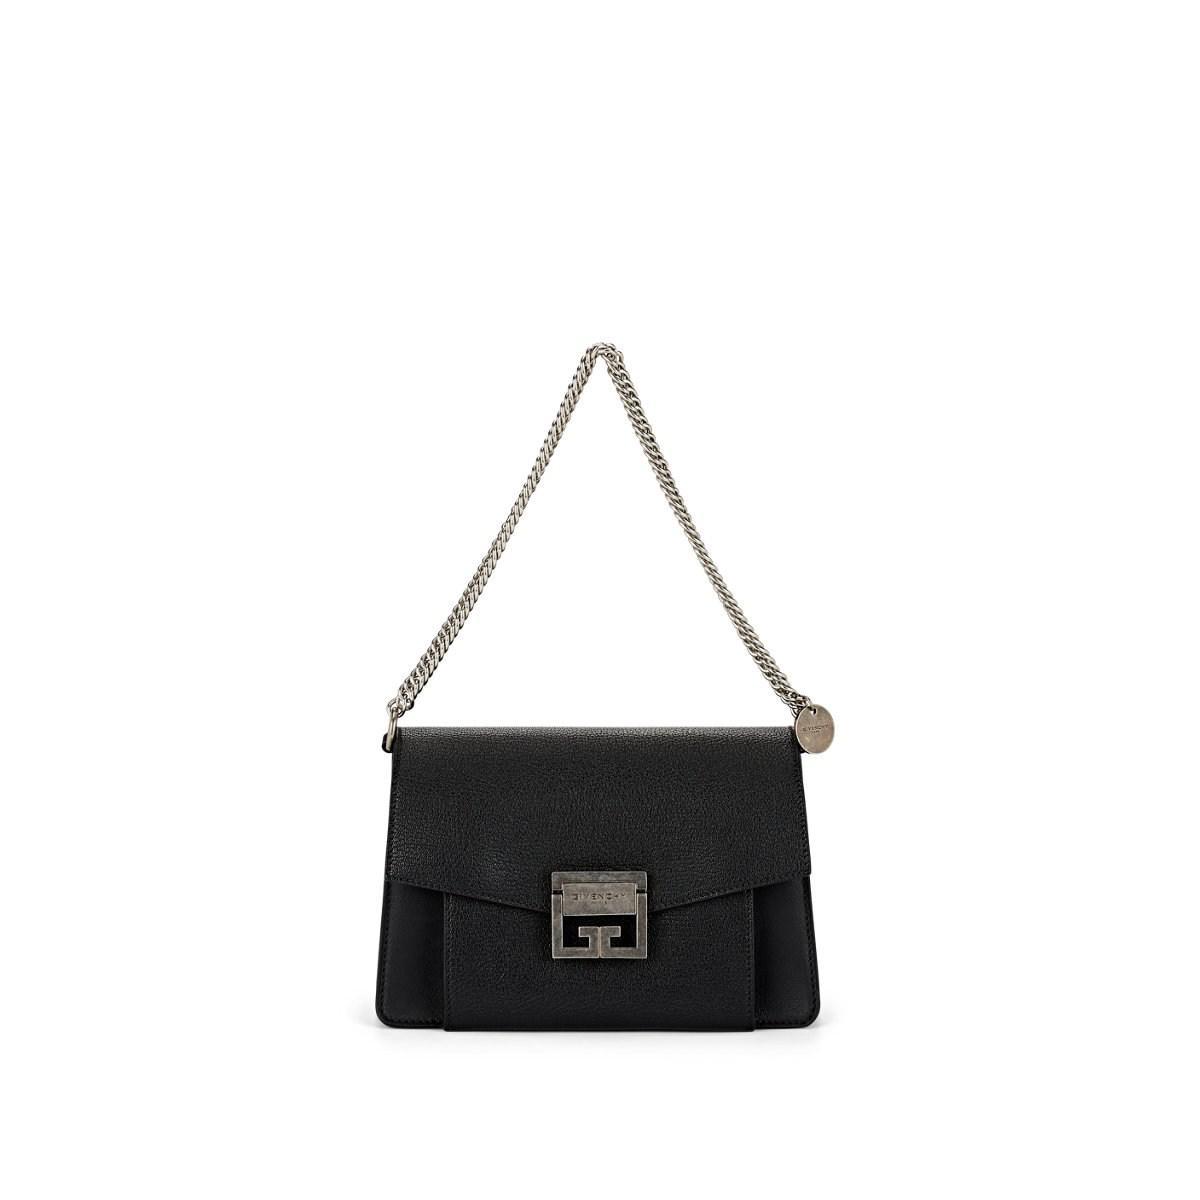 77b823c1c06 Givenchy - Black Gv3 Small Leather Shoulder Bag - Lyst. View fullscreen